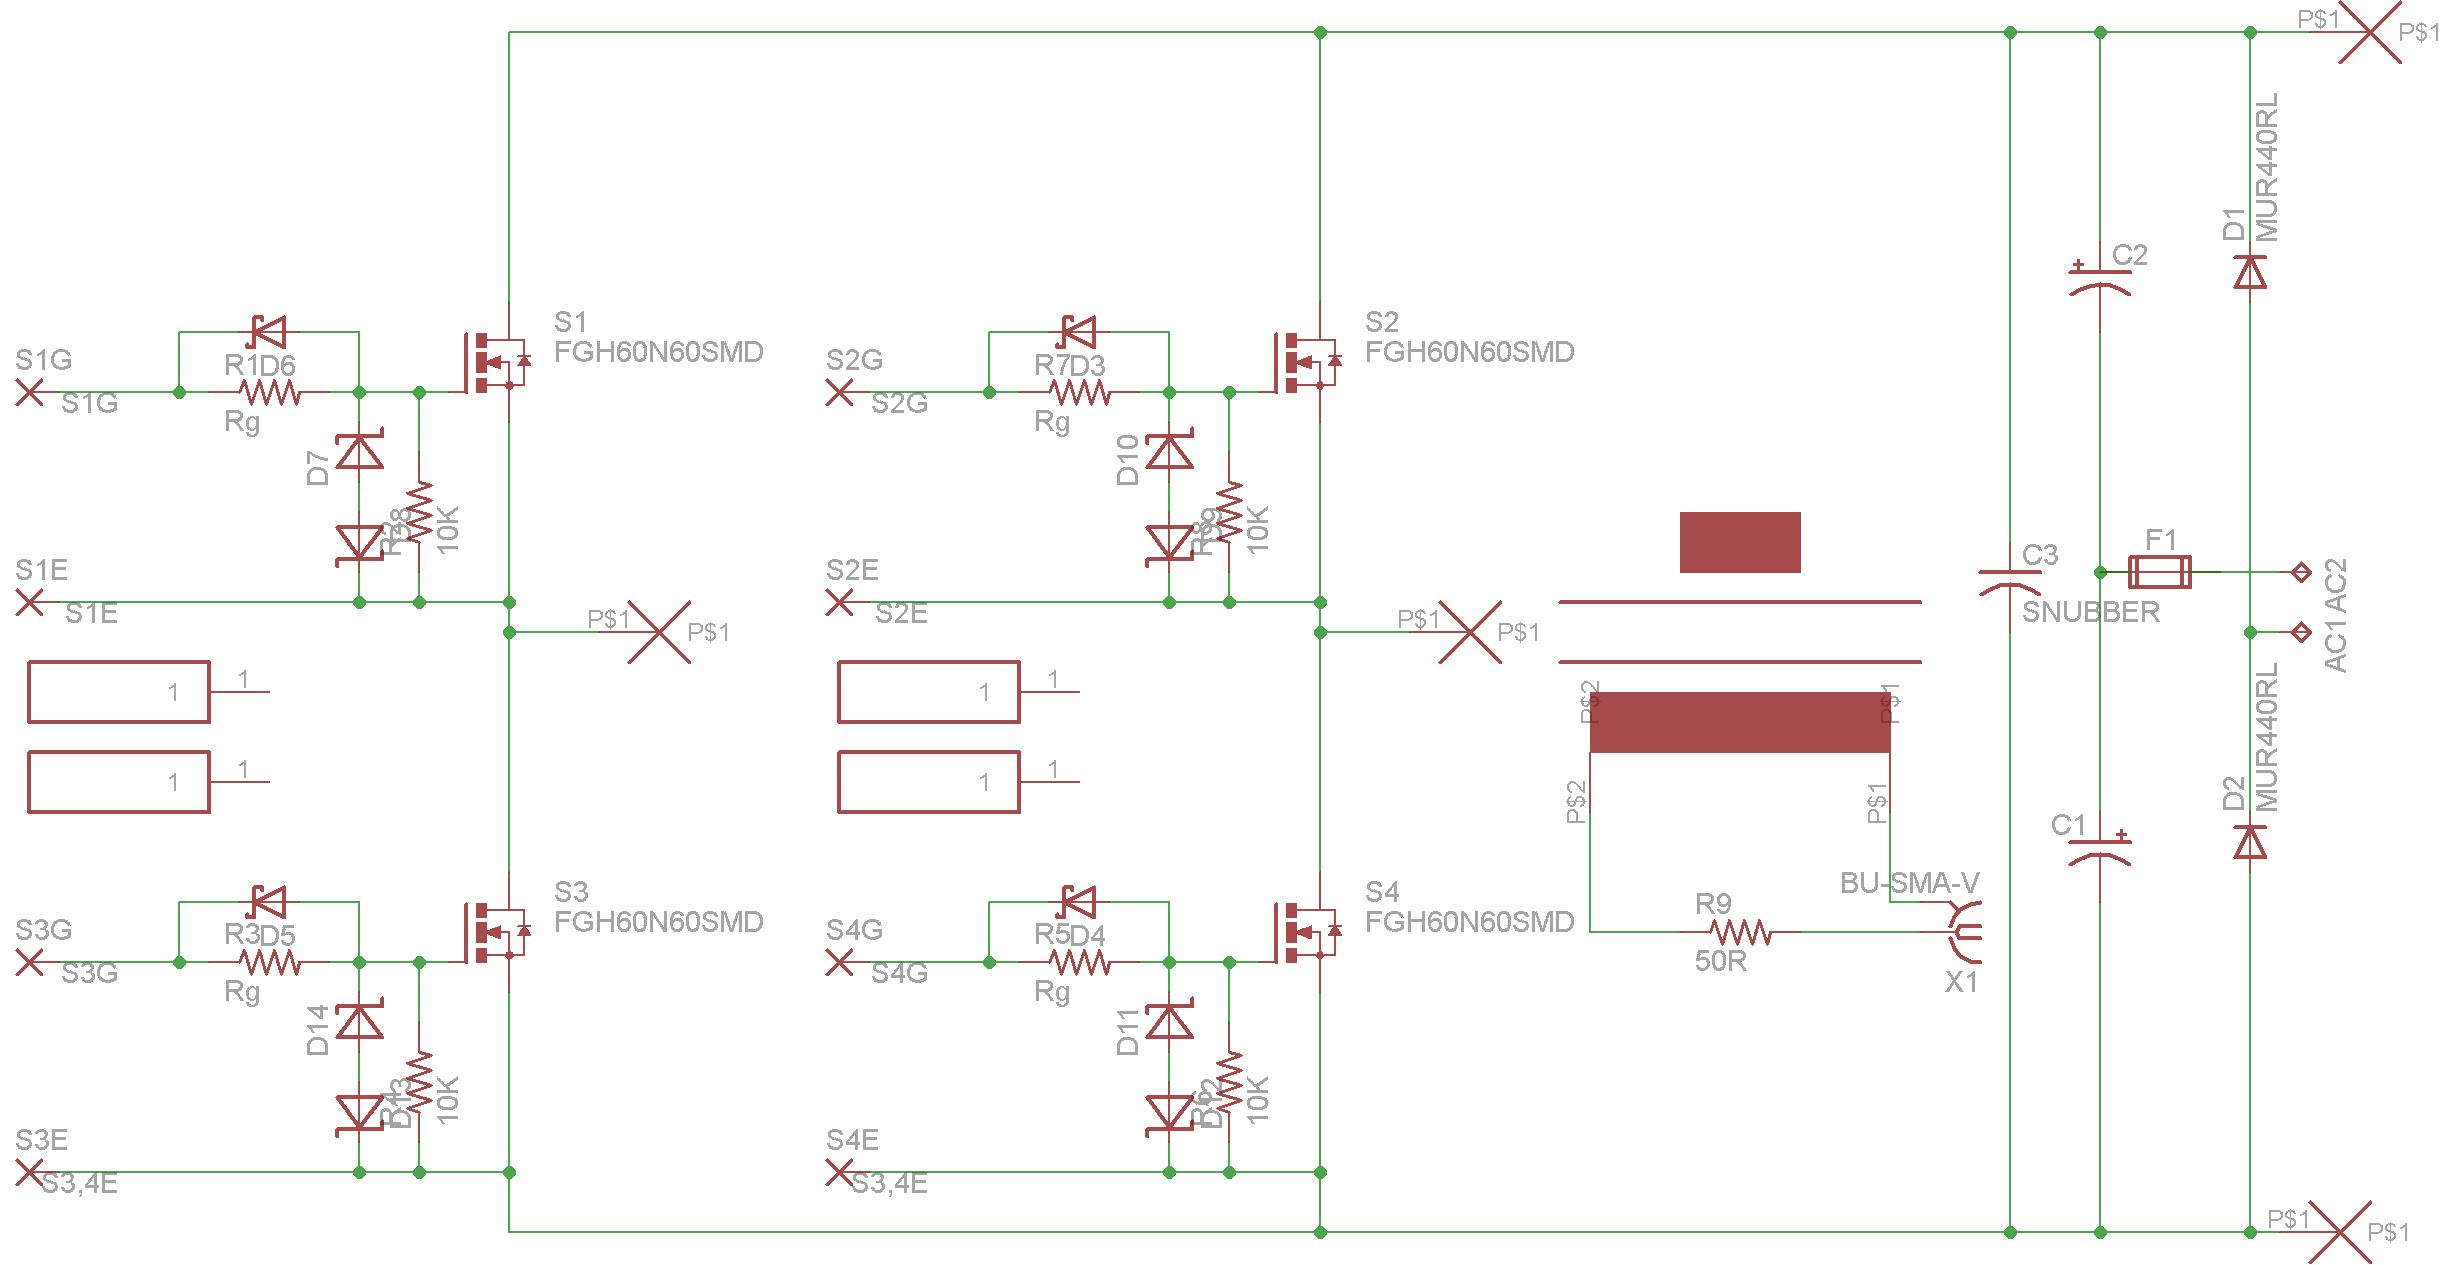 12 Volt To 220 Volt Inverter 500w likewise Inverter 12v To 220v moreover Simple Dc To Dc Voltage Doubler Circuit together with 12 Vdc To 240 Vac Inverter besides Fence Parts Diagram. on circuit diagram of inverter 12v to 220v